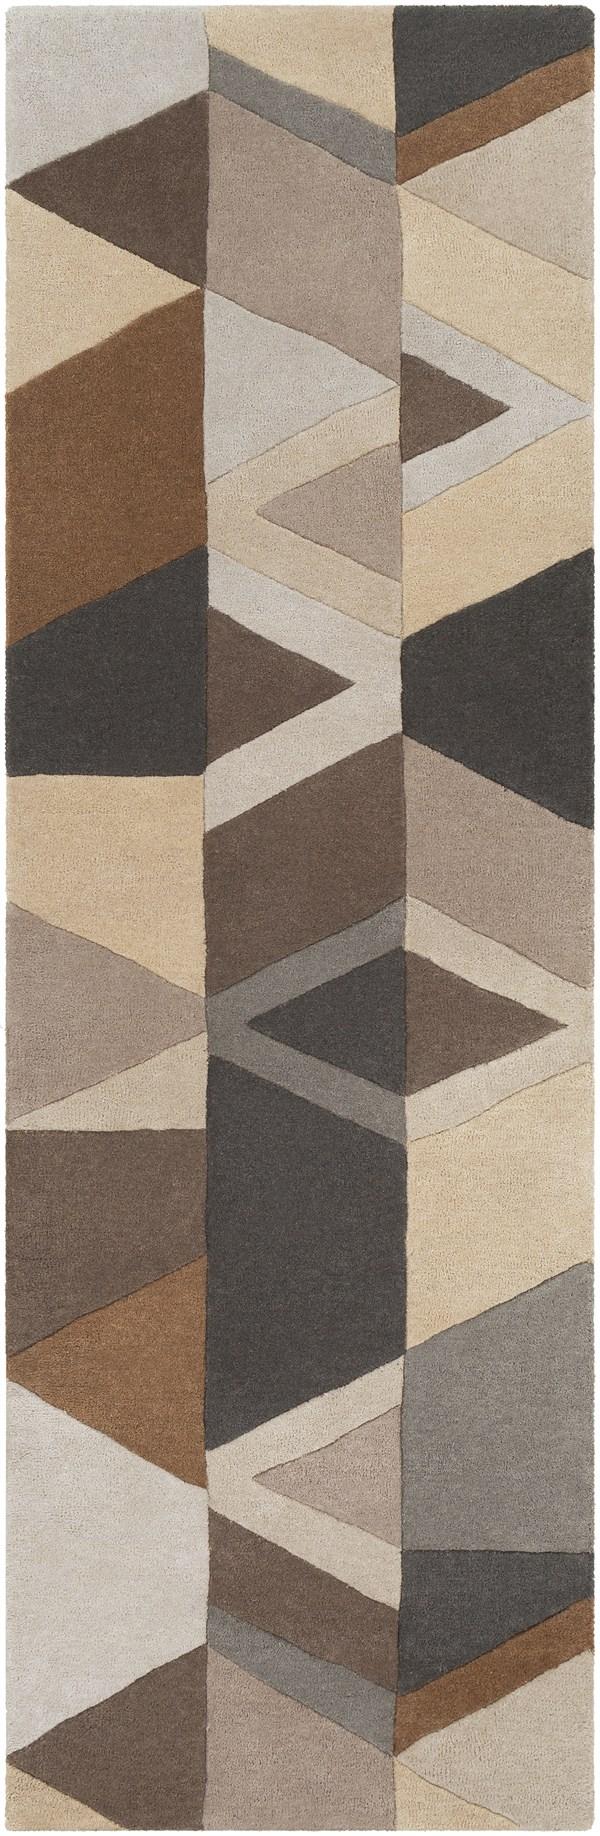 Grey, Ice Blue, Charcoal Geometric Area Rug